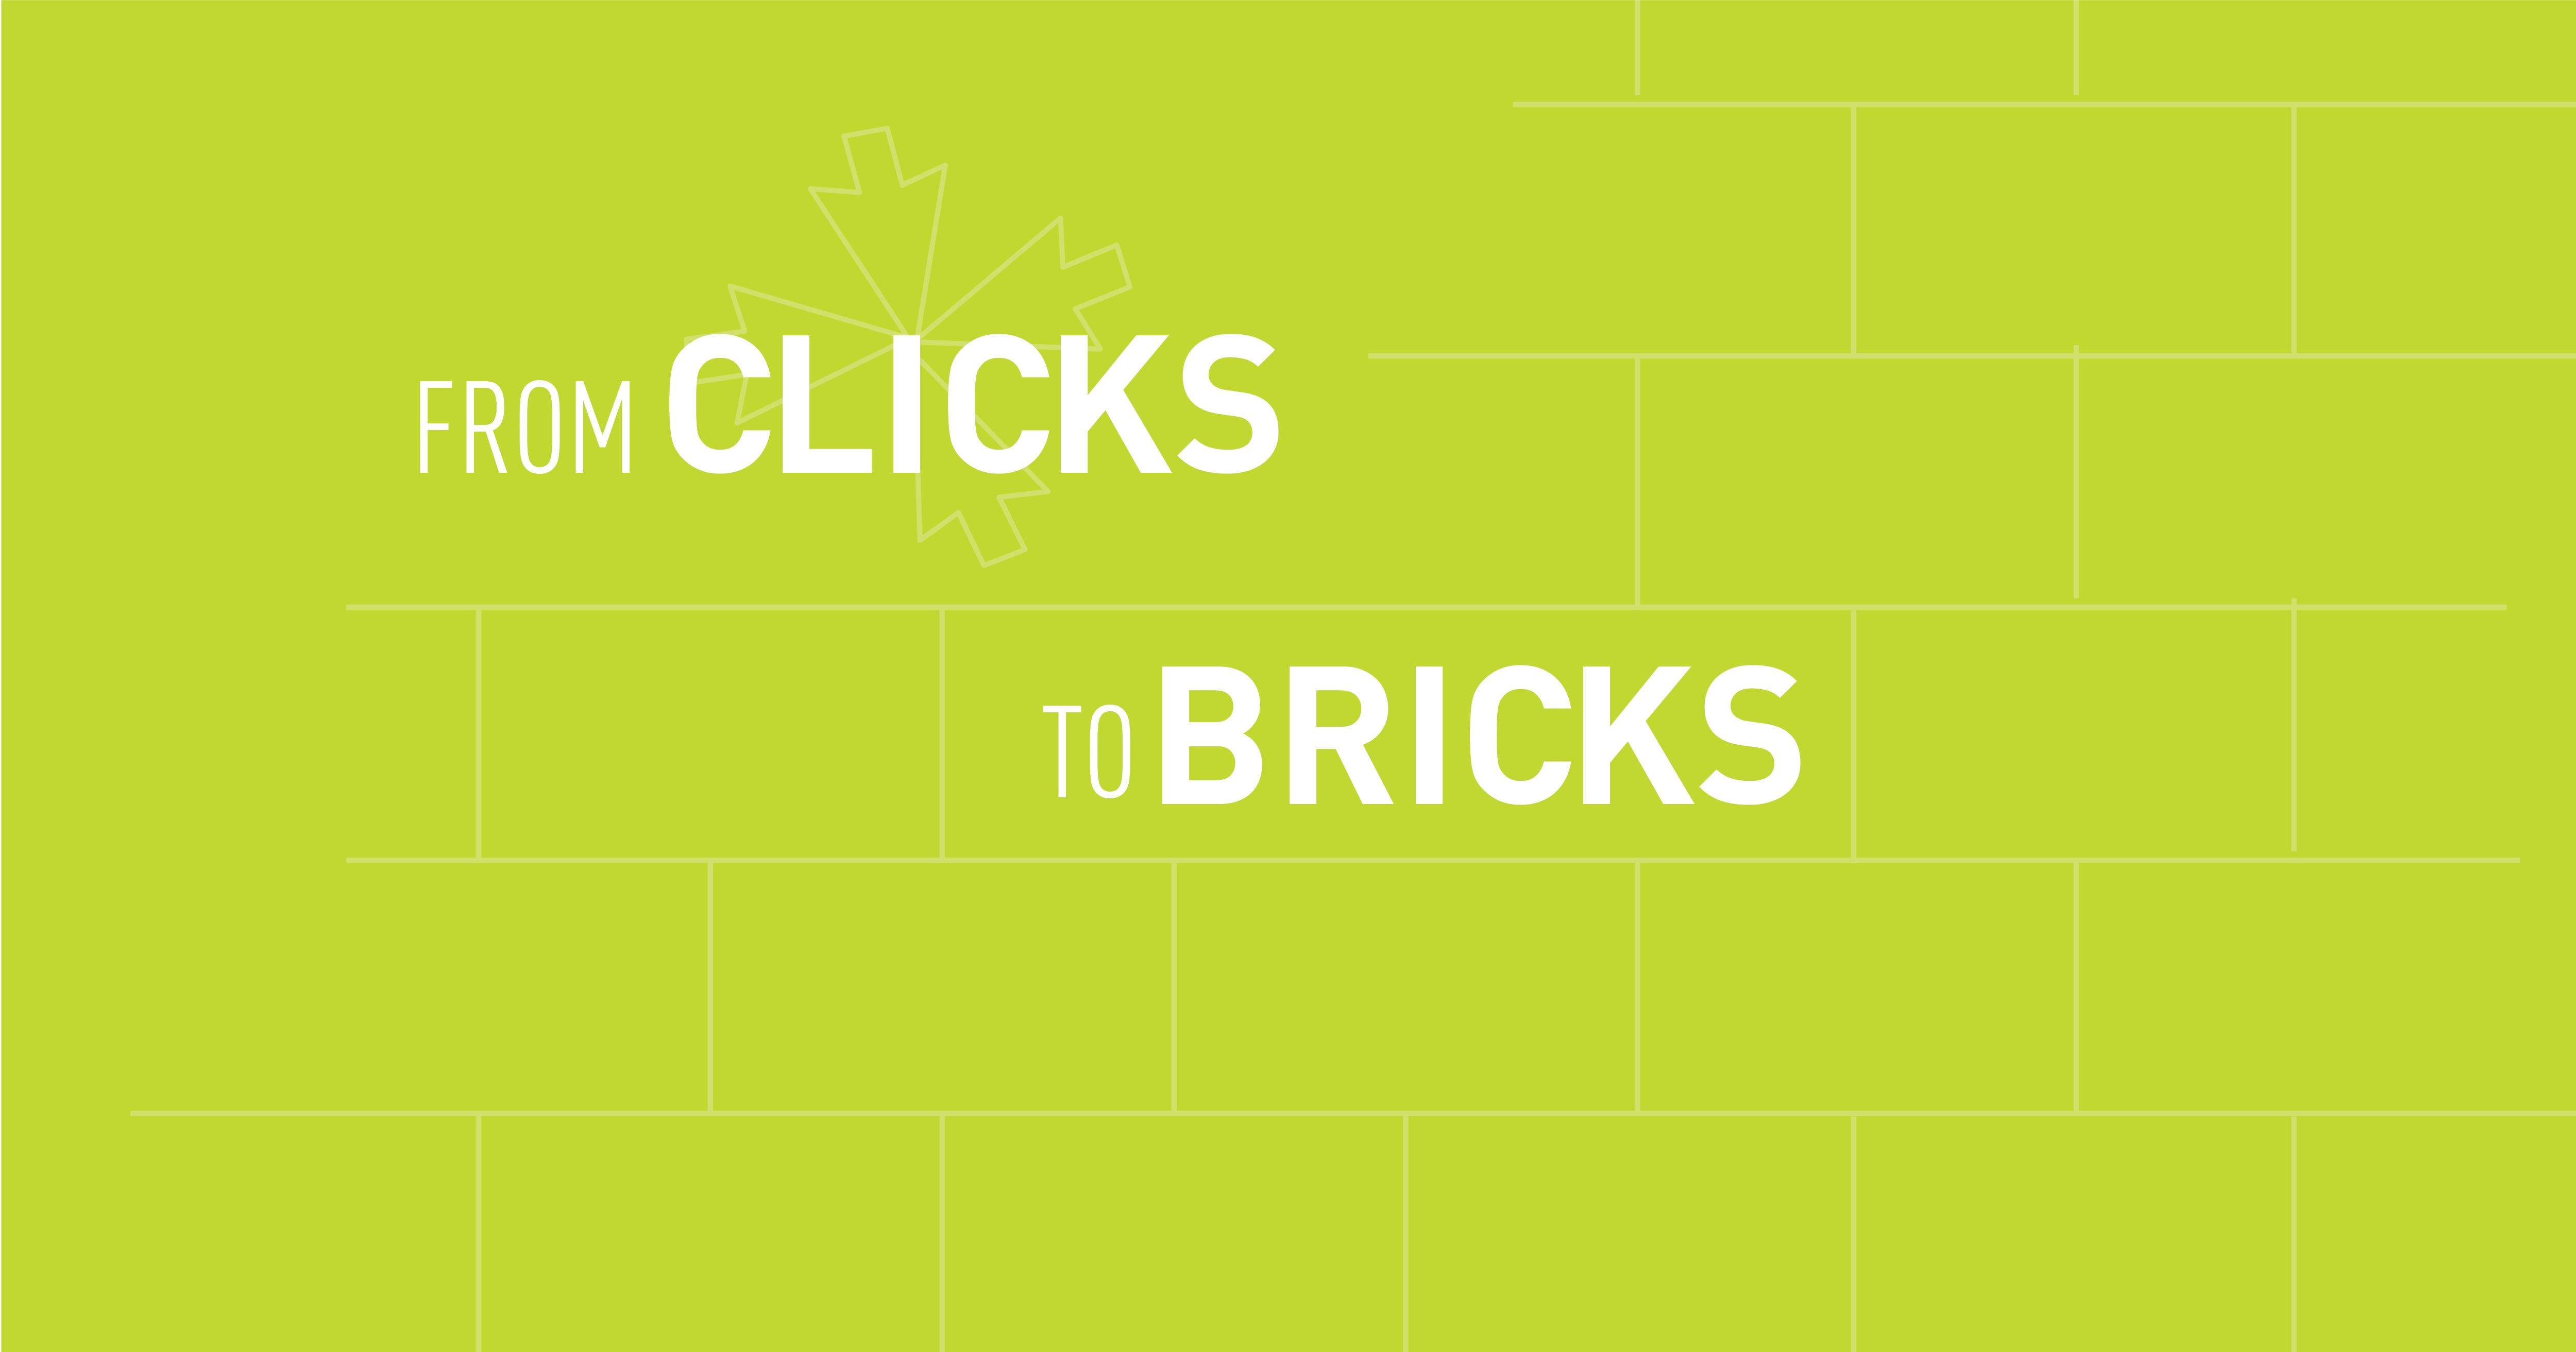 from clicks to bricks